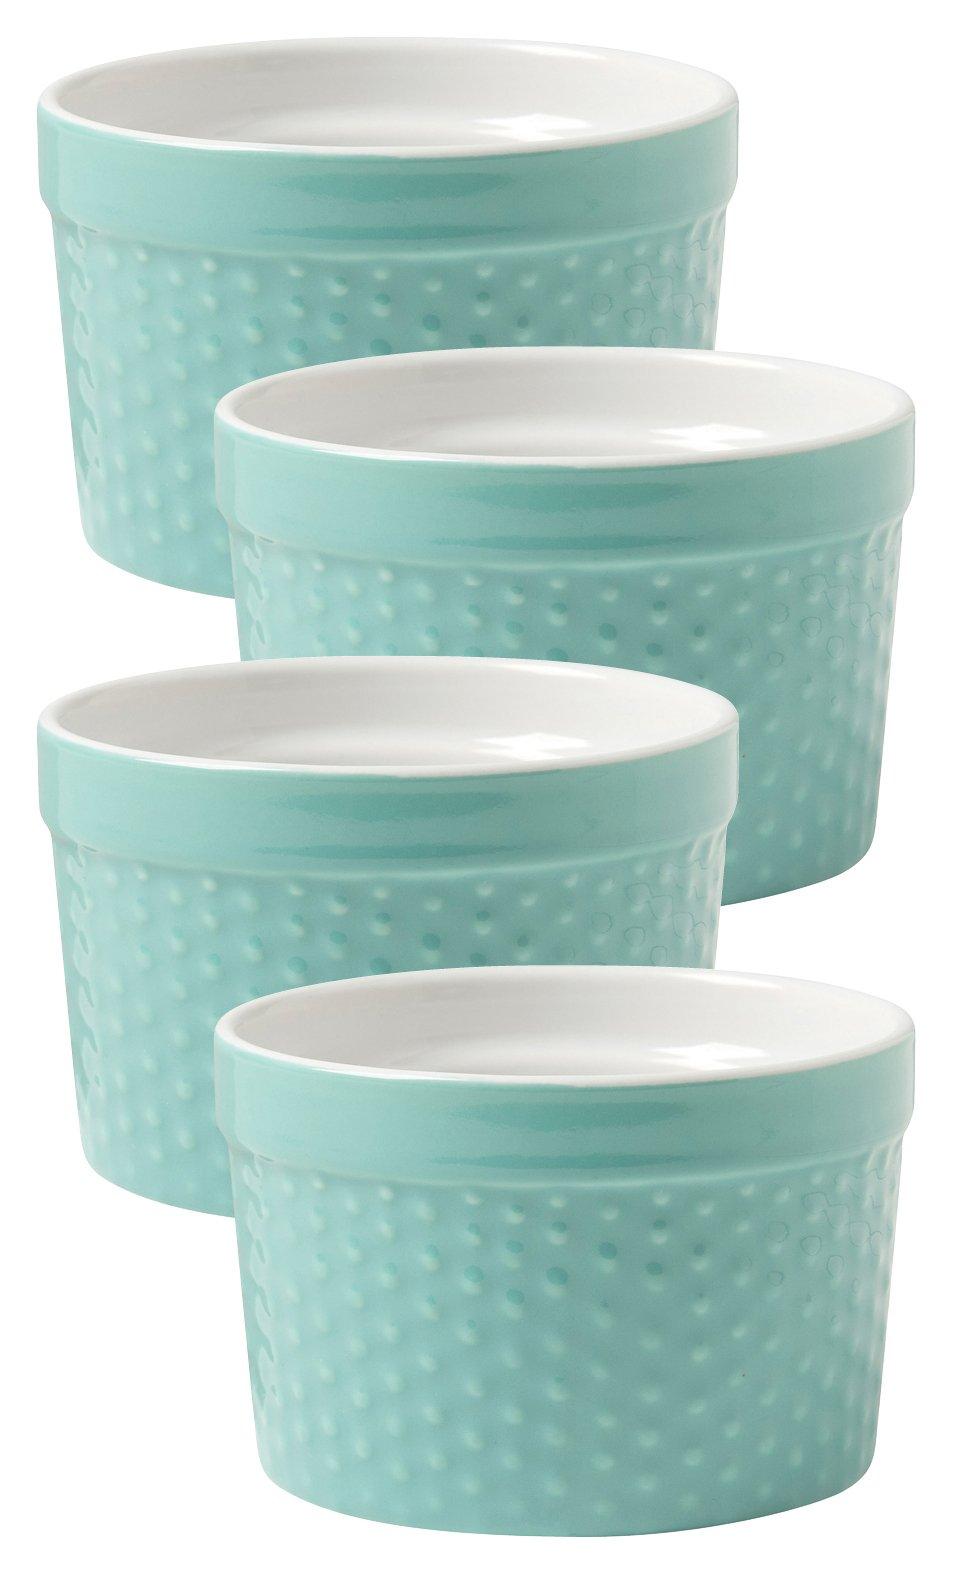 Now Designs Dot Ramekins, Surf Blue, Set of 4 by Now Designs (Image #2)